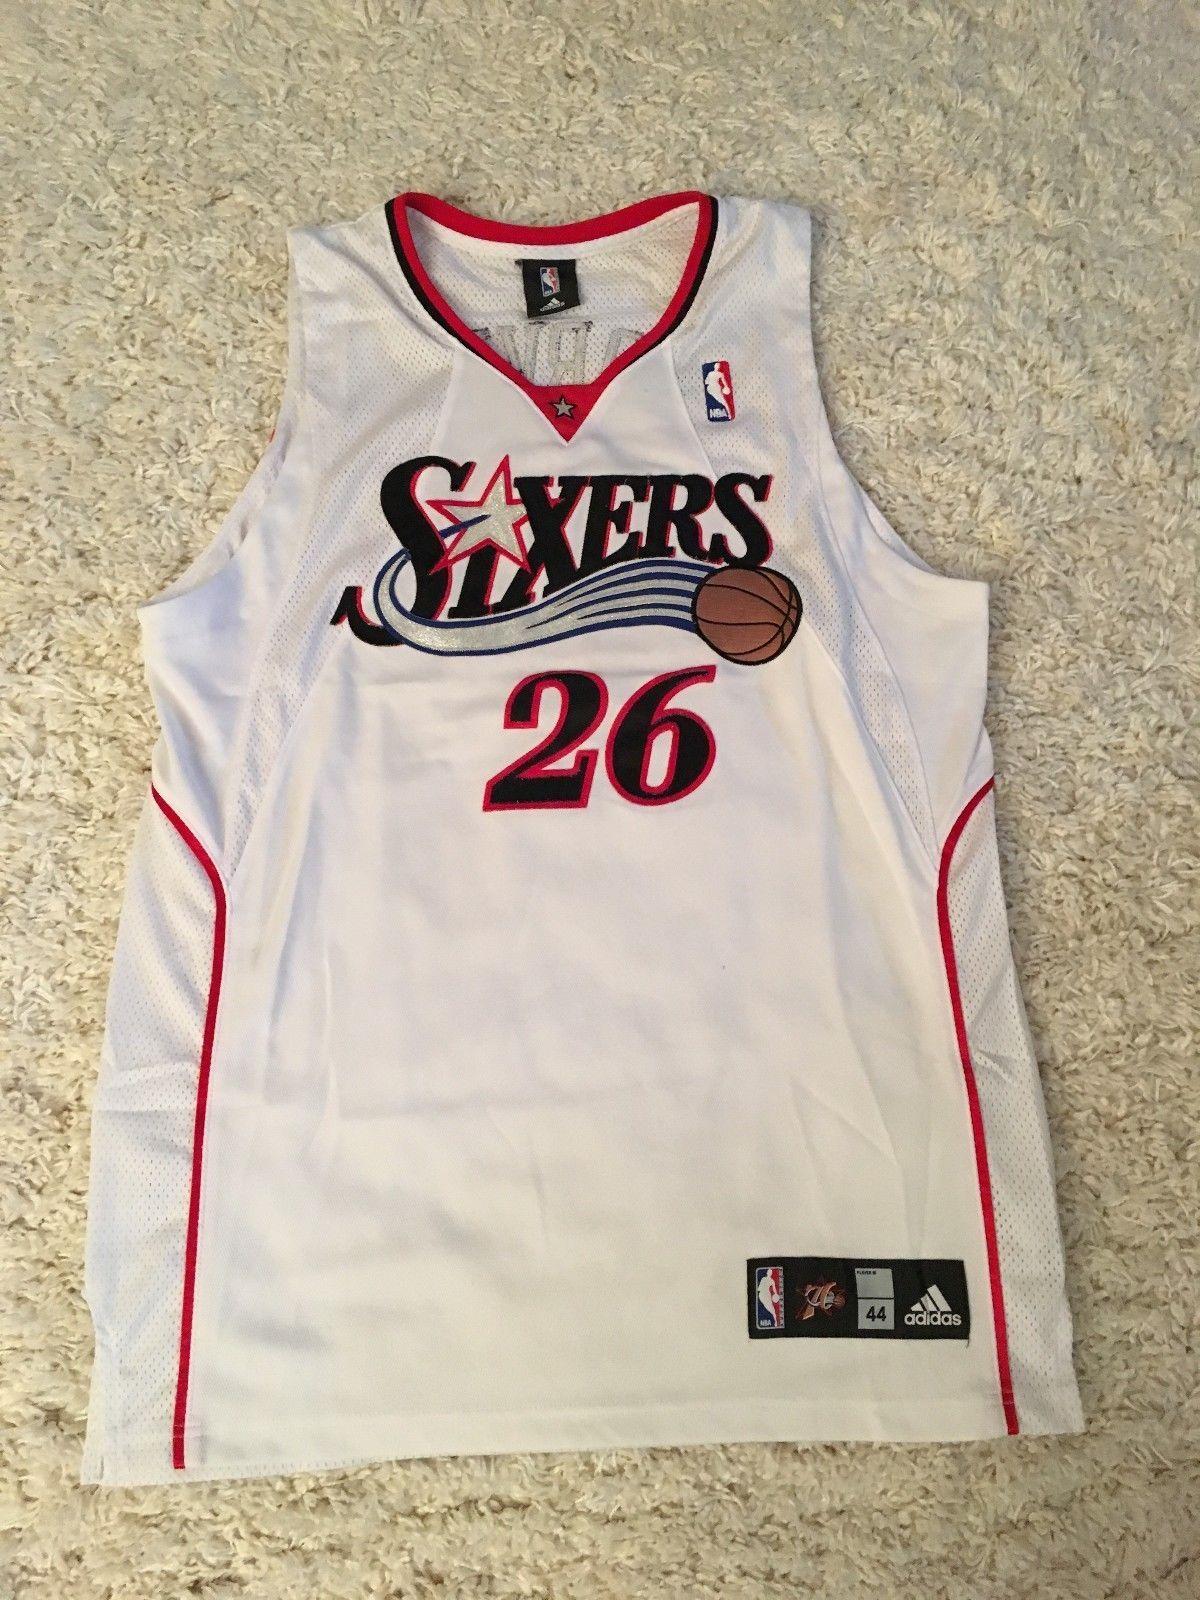 490b0dcf0c9 ... clearance kyle korver philadelphia 76ers sixers authentic adidas jersey  size 44 ebay link 6dd97 e8e44